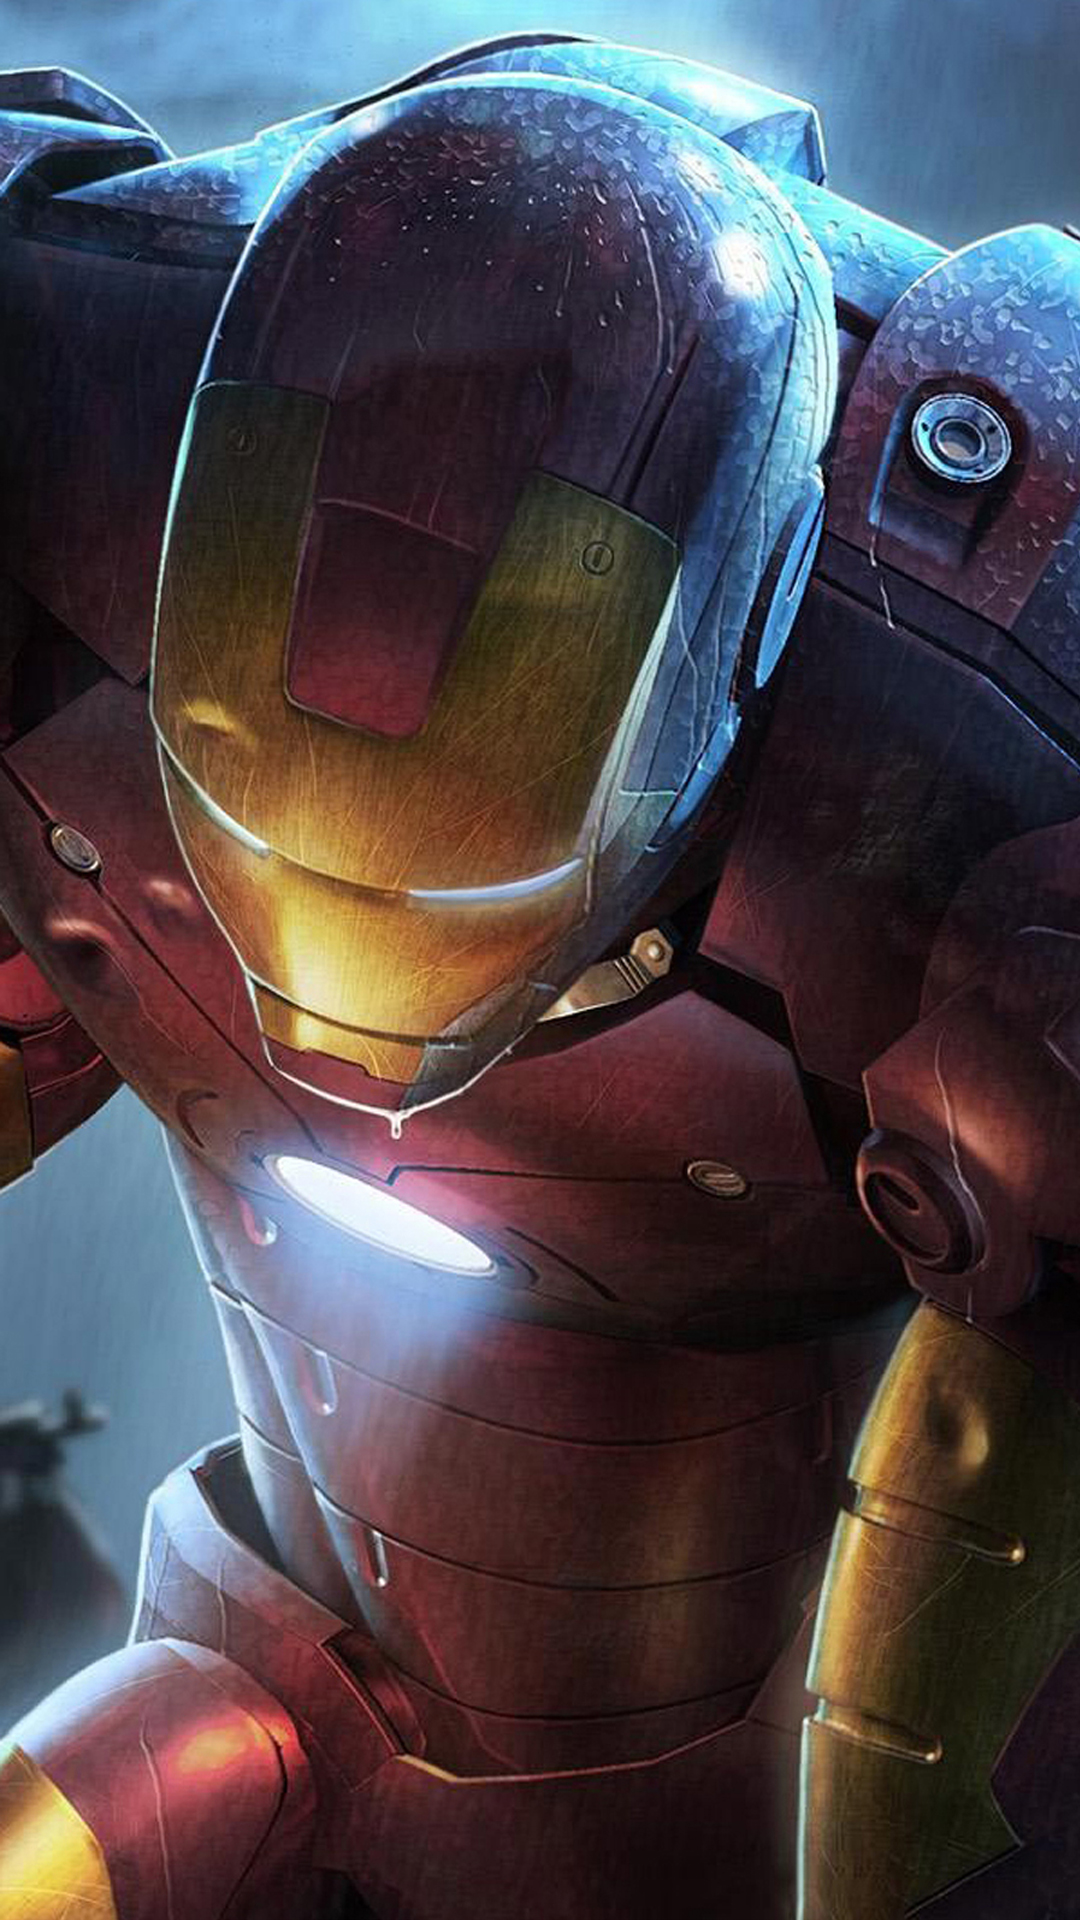 Iron Man Illustration android wallpaper HD 1080x1920